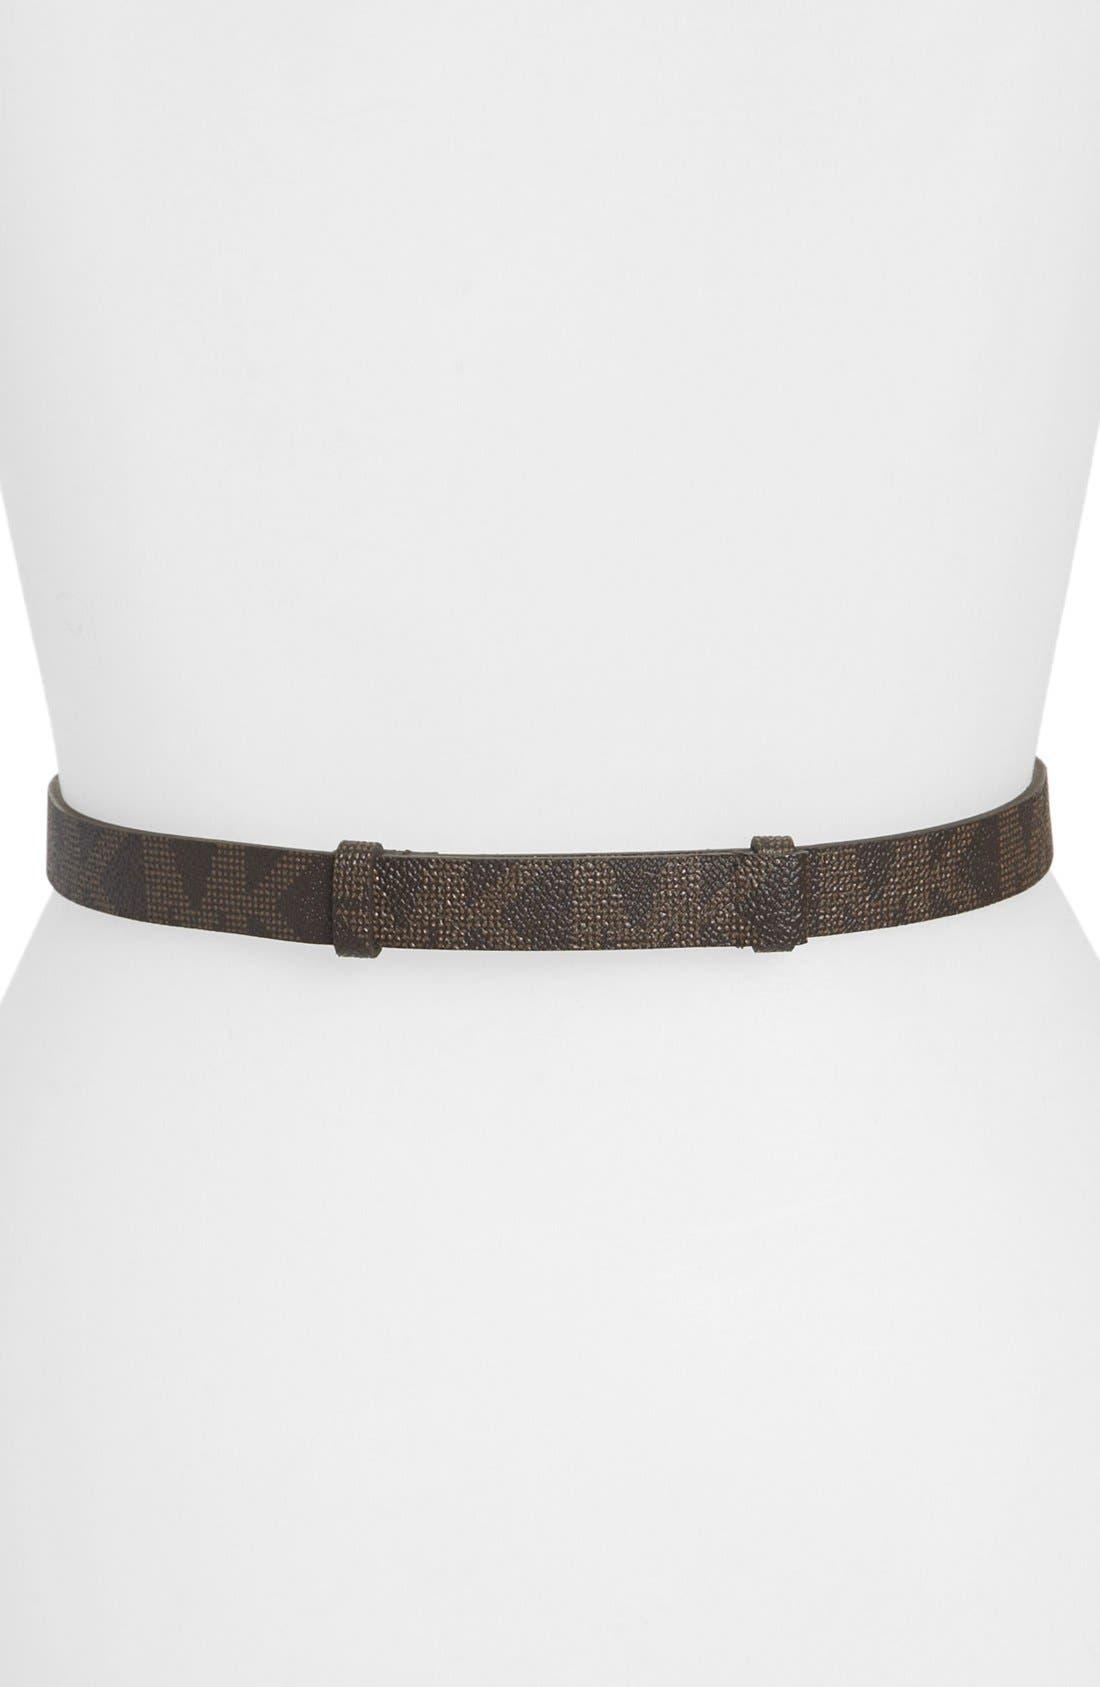 Alternate Image 2  - MICHAEL Michael Kors Interlocking Logo Belt